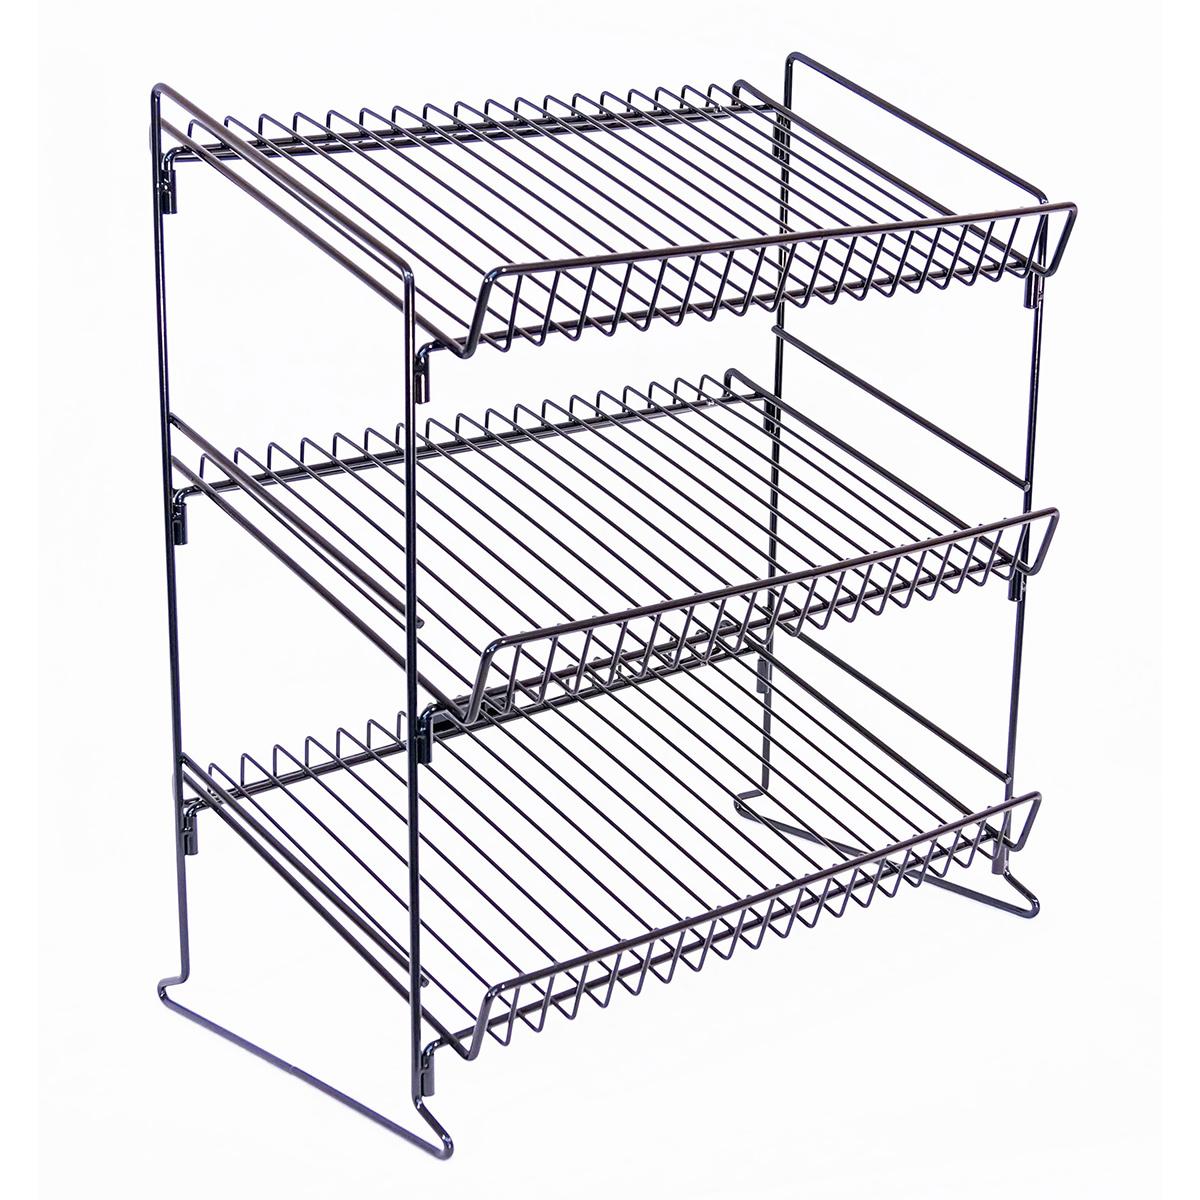 3 Shelf Wire Counter Display Rack